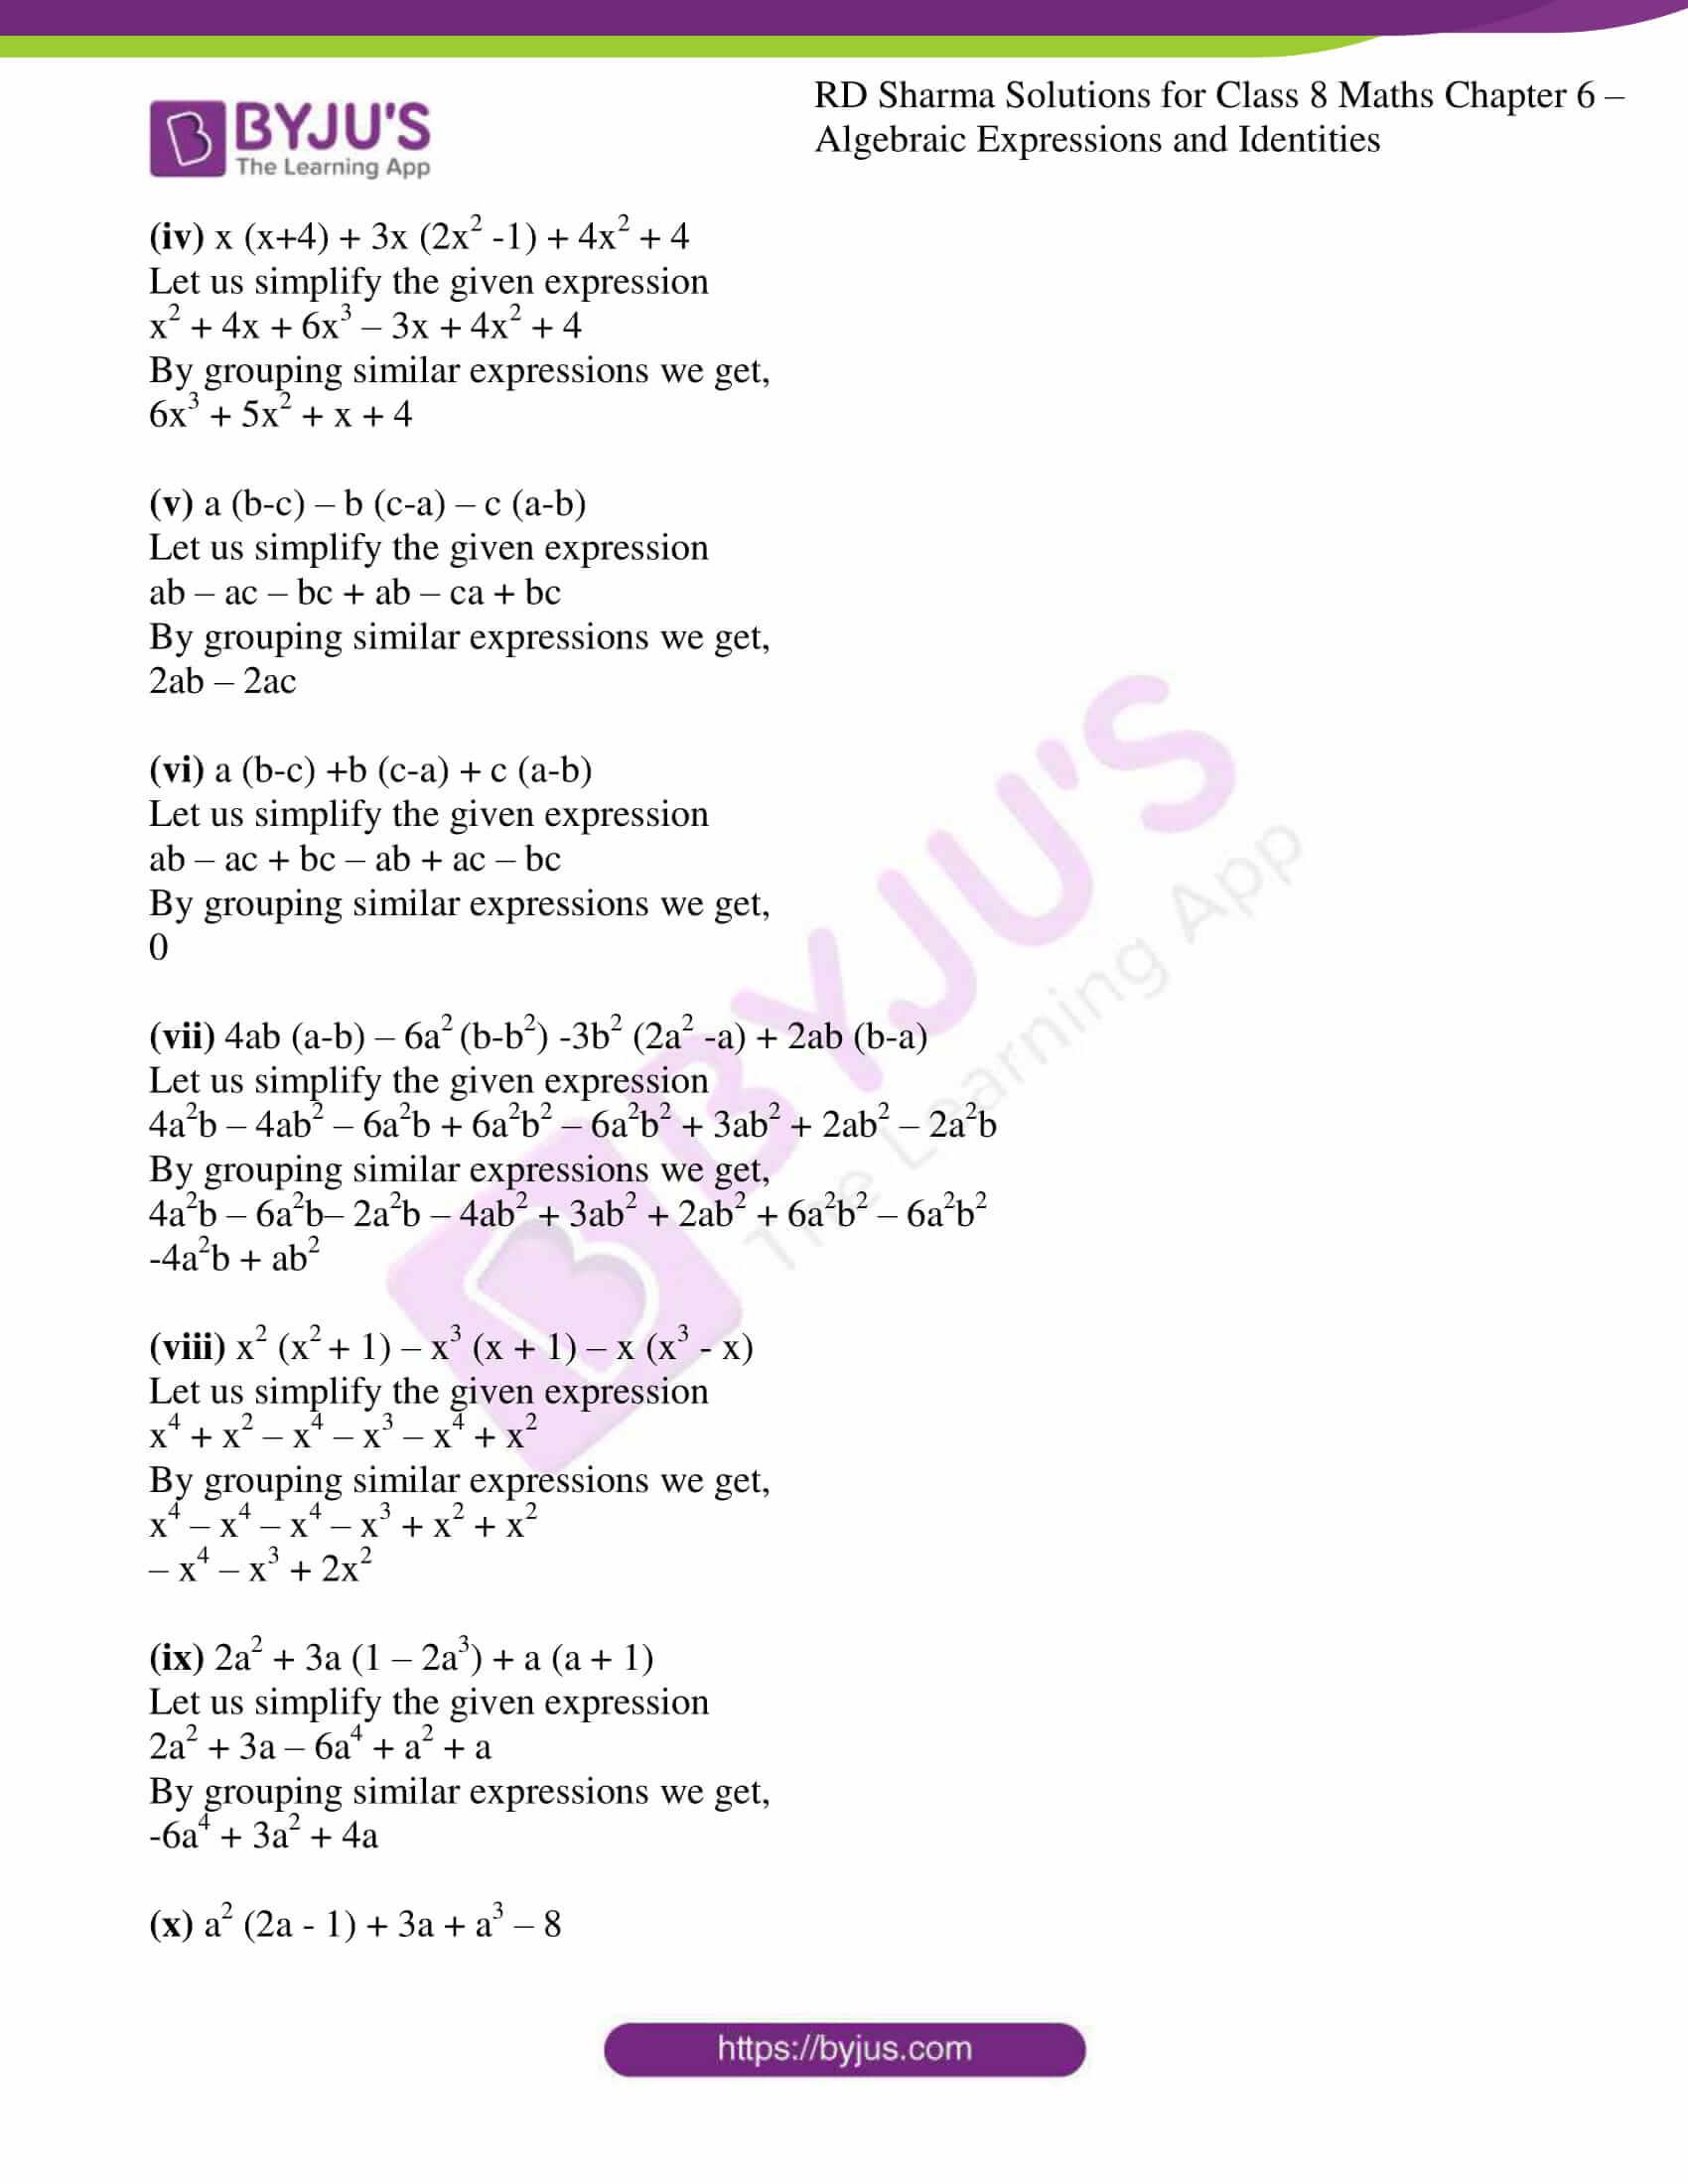 rd sharma class 8 maths chapter 6 exercise 4 7